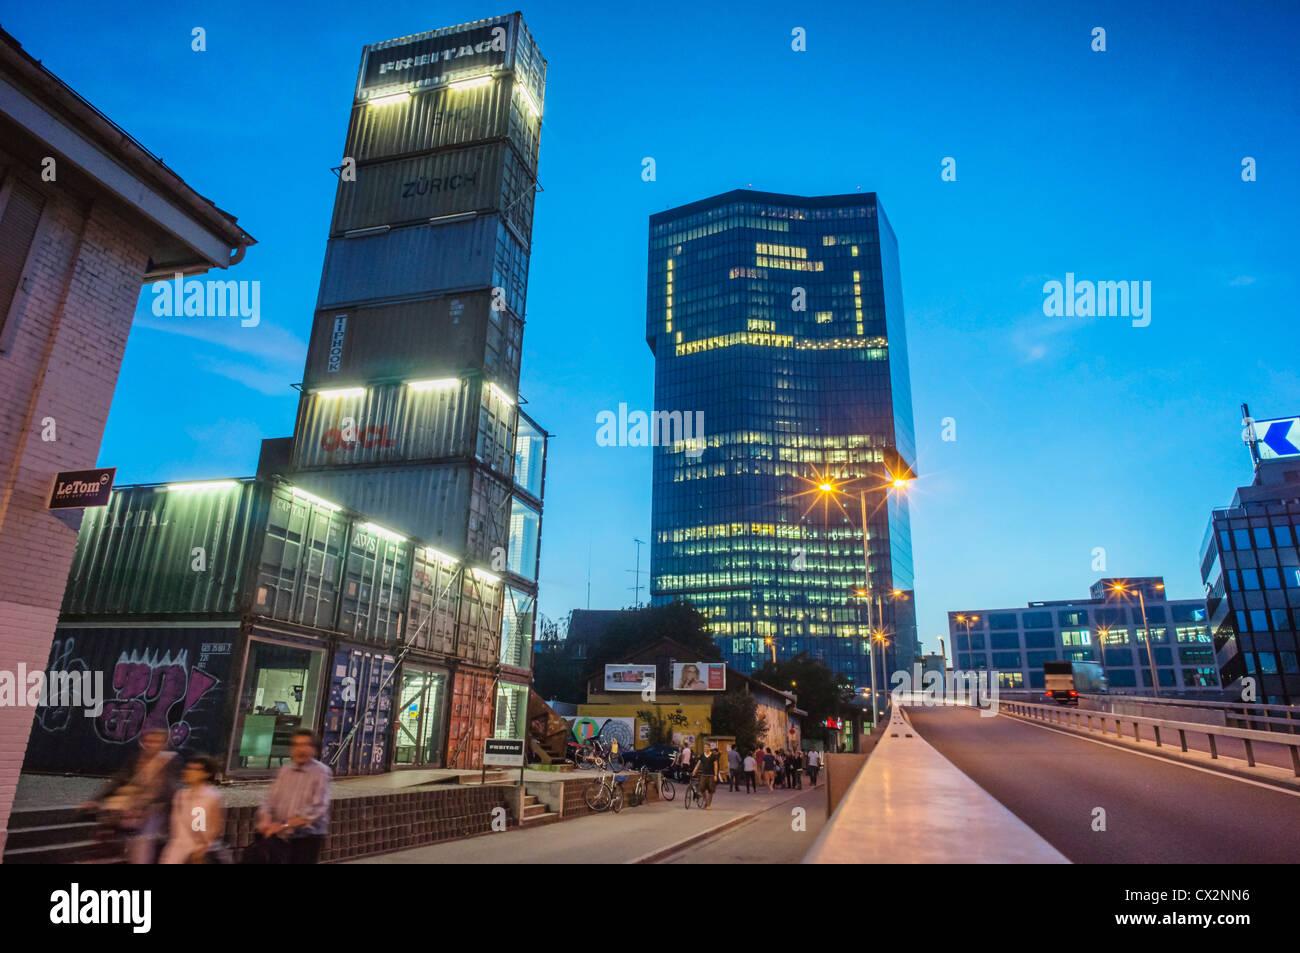 Freitag concept store, Prime tower, Kreis 5, Zurich,  - Stock Image